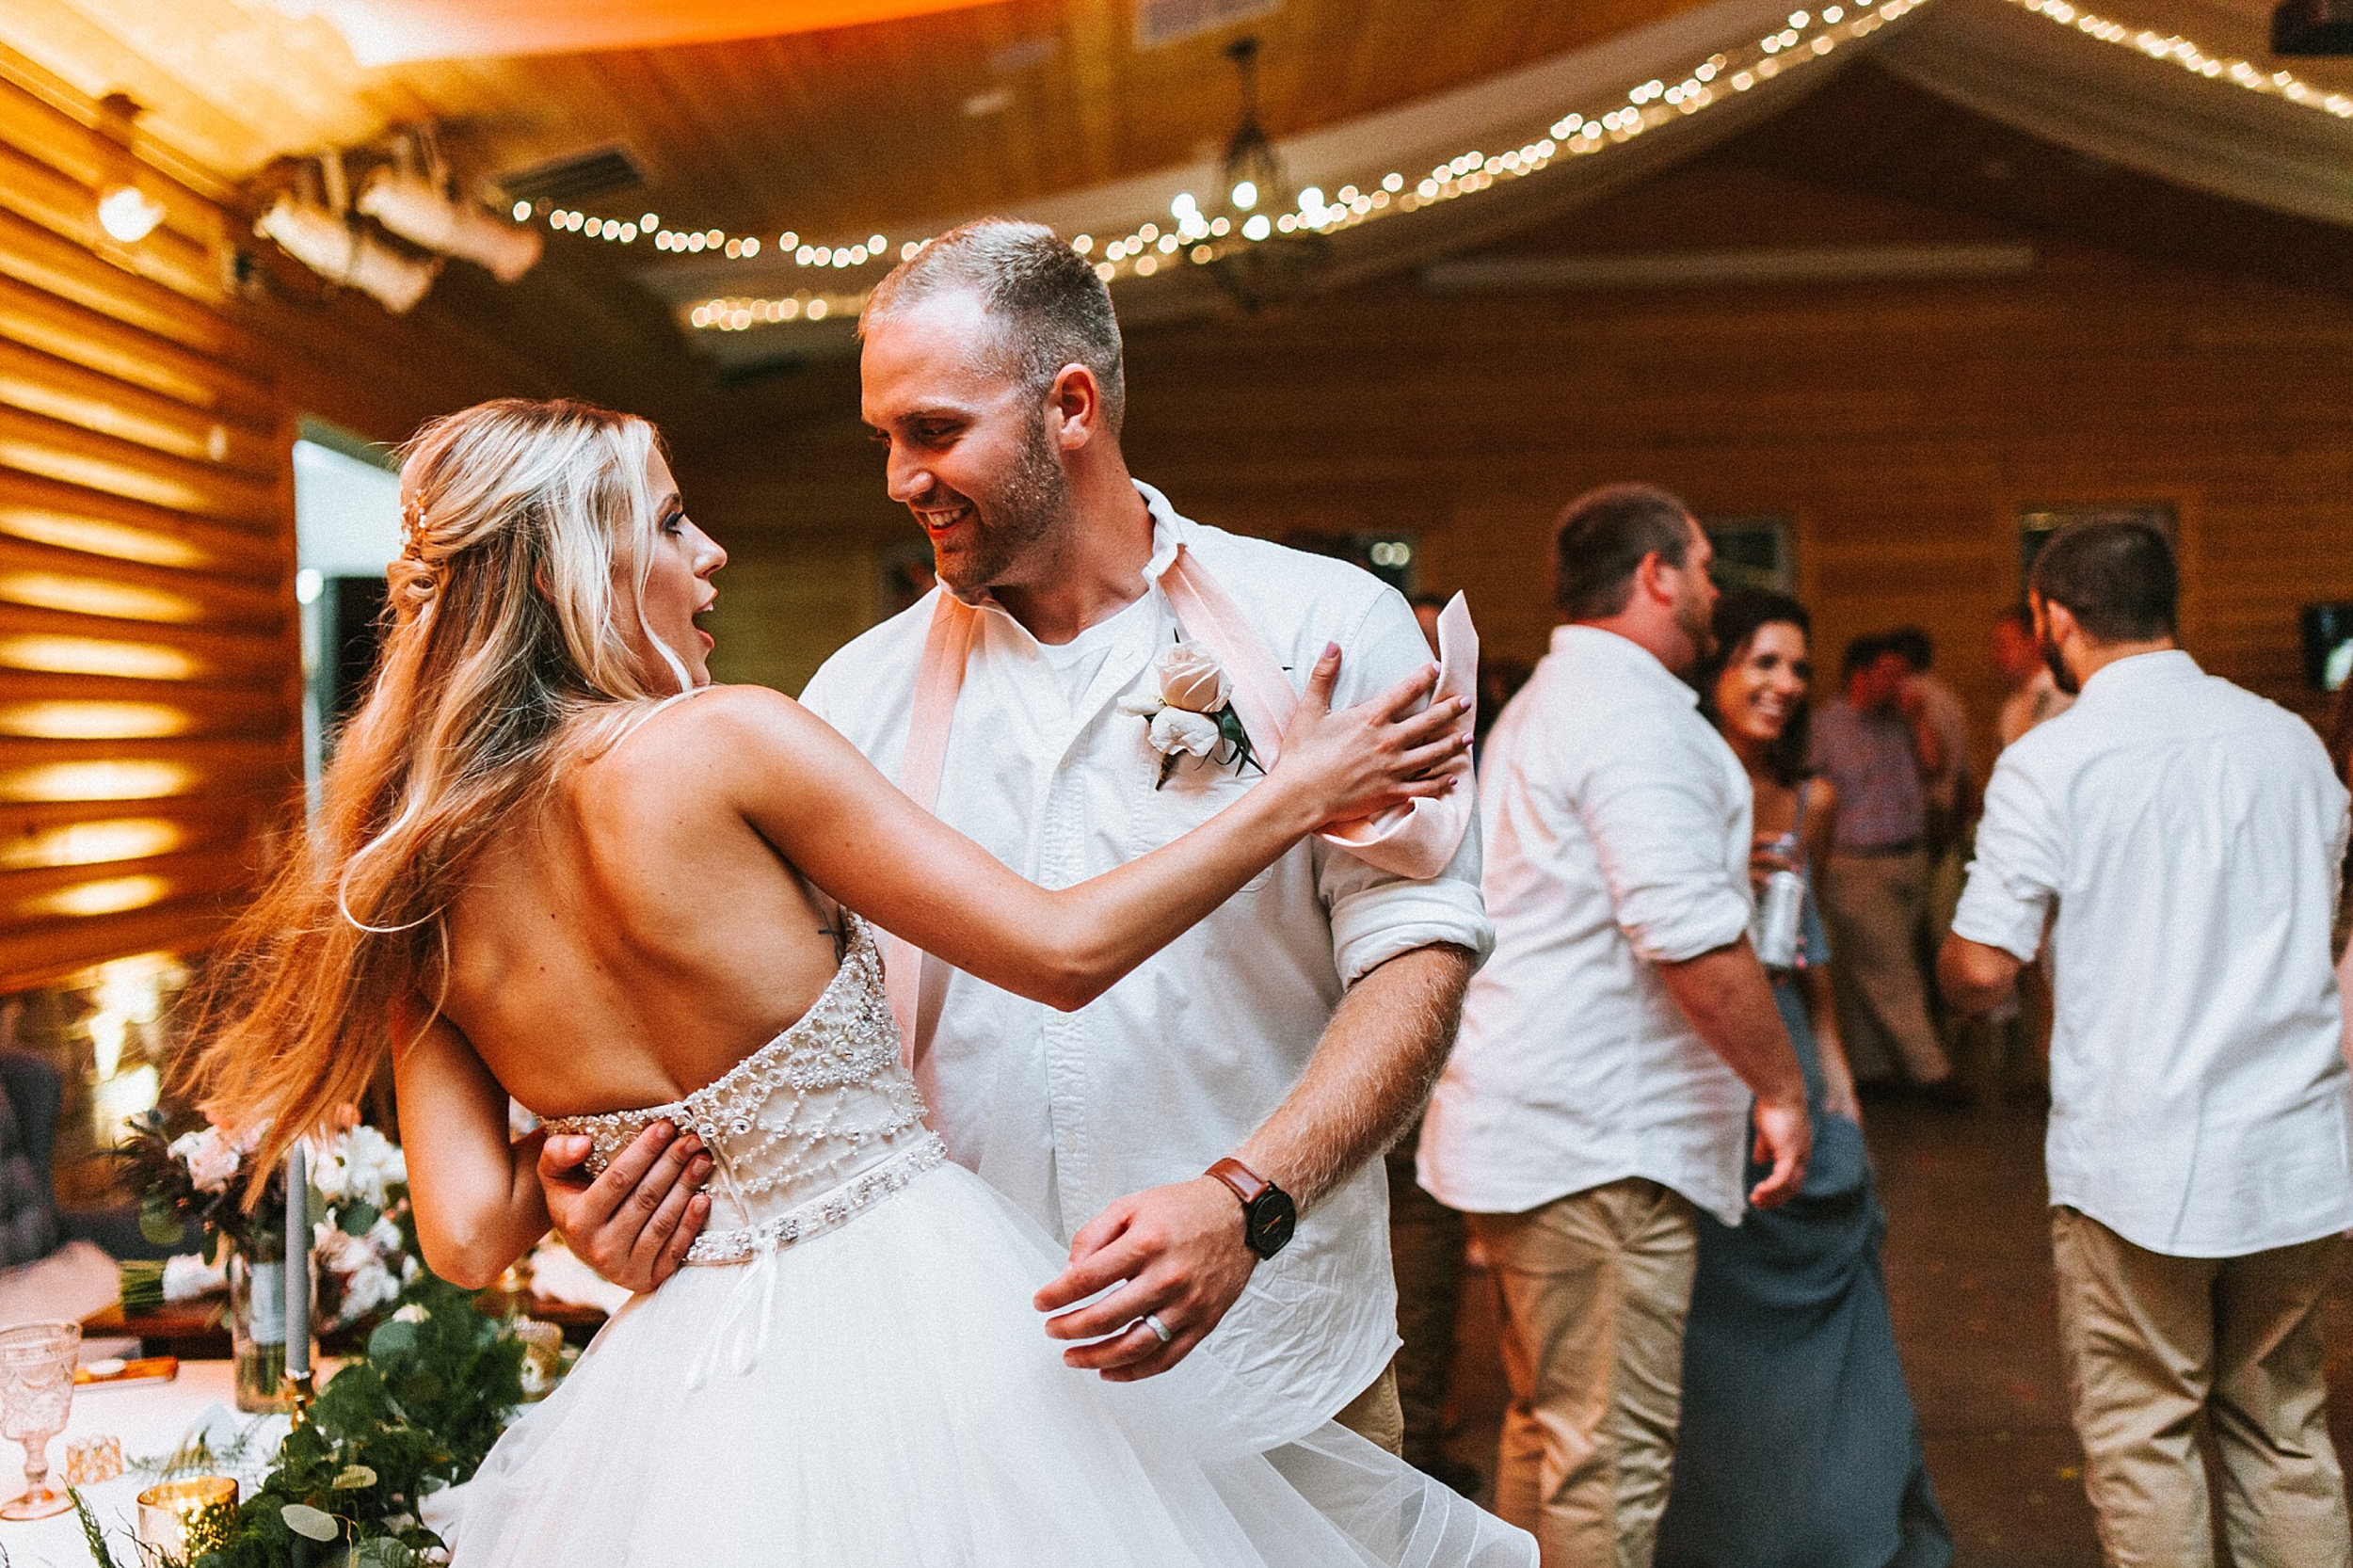 Brooke Townsend Photography - Cincinnati Wedding Photographer (151 of 153).jpg